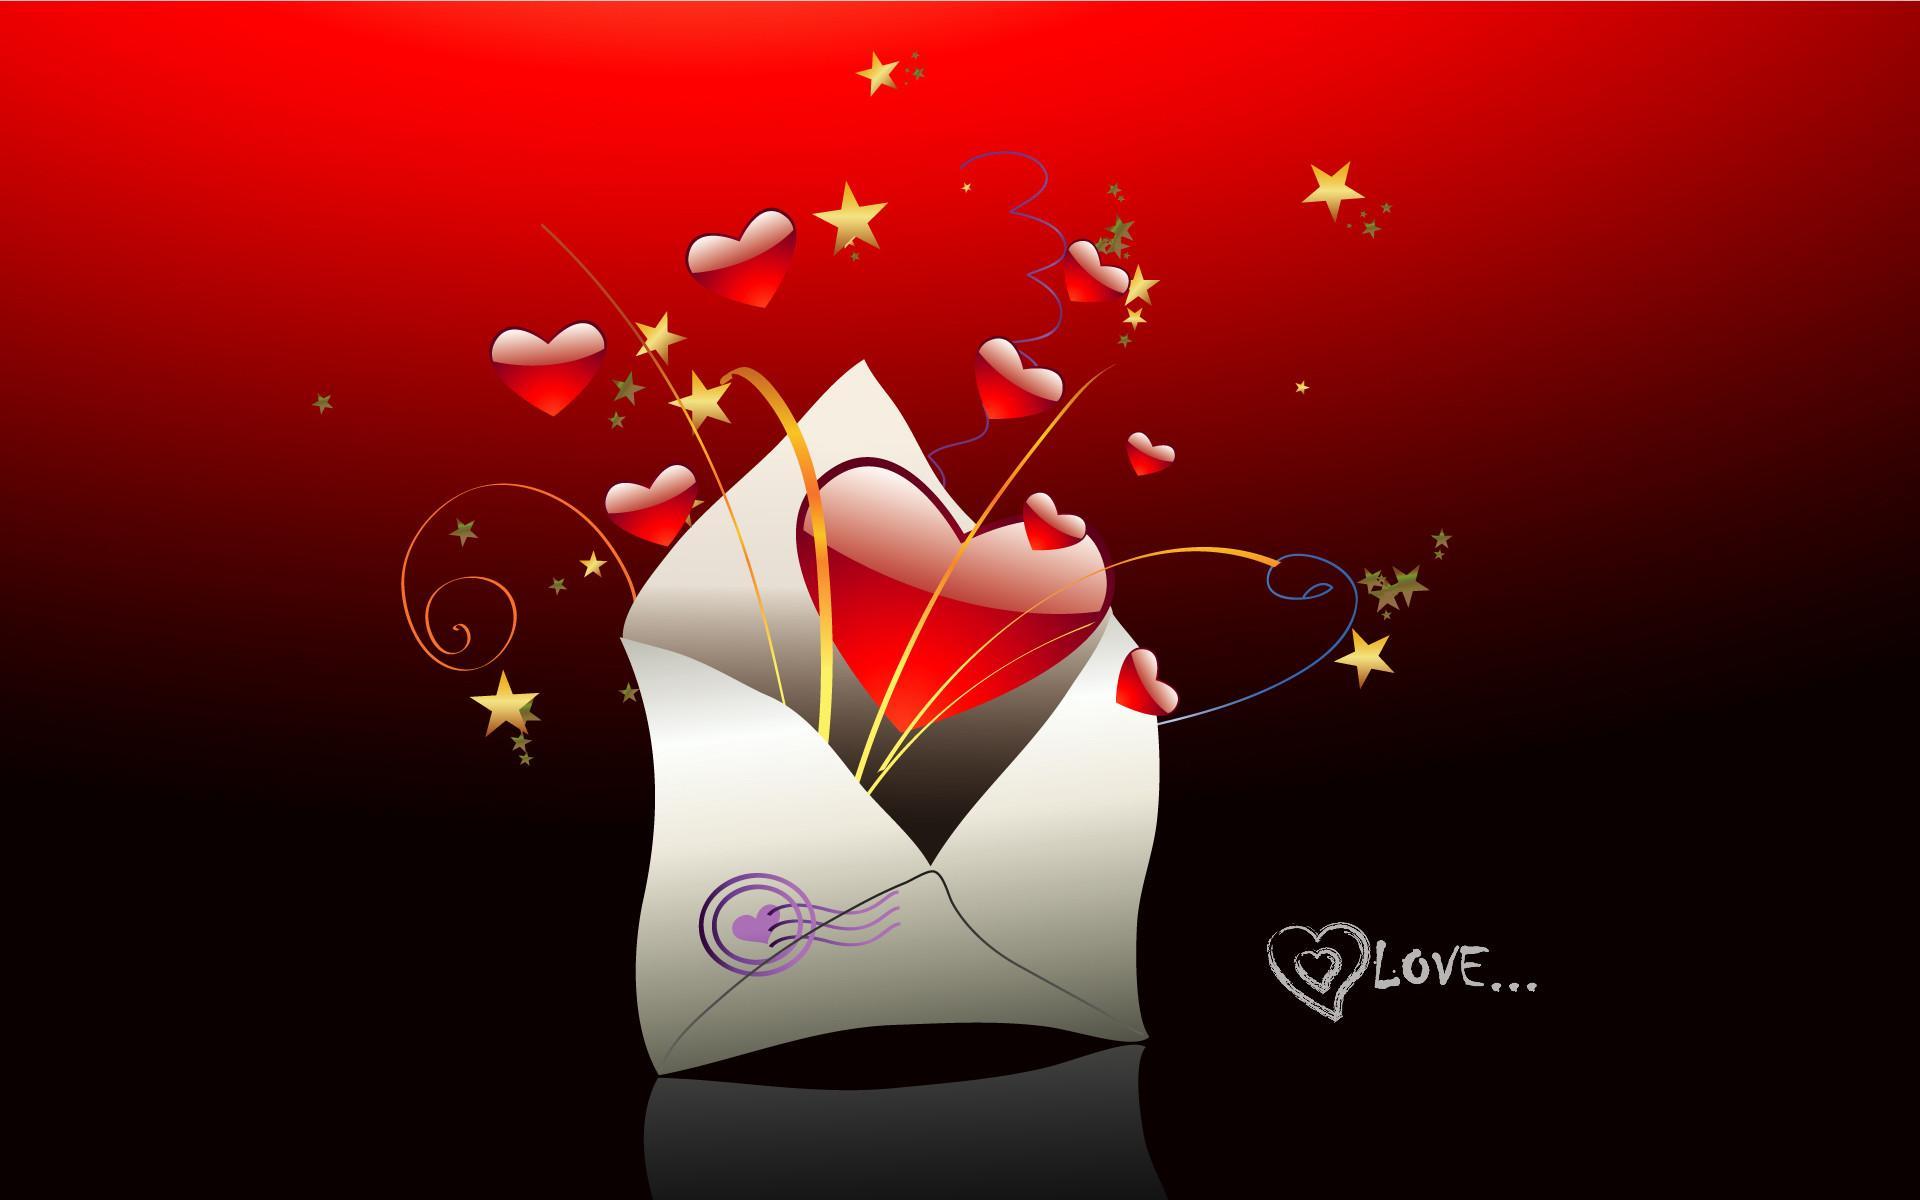 Wallpaper download i love you - I Love You Hd Wallpapers Fbpapa